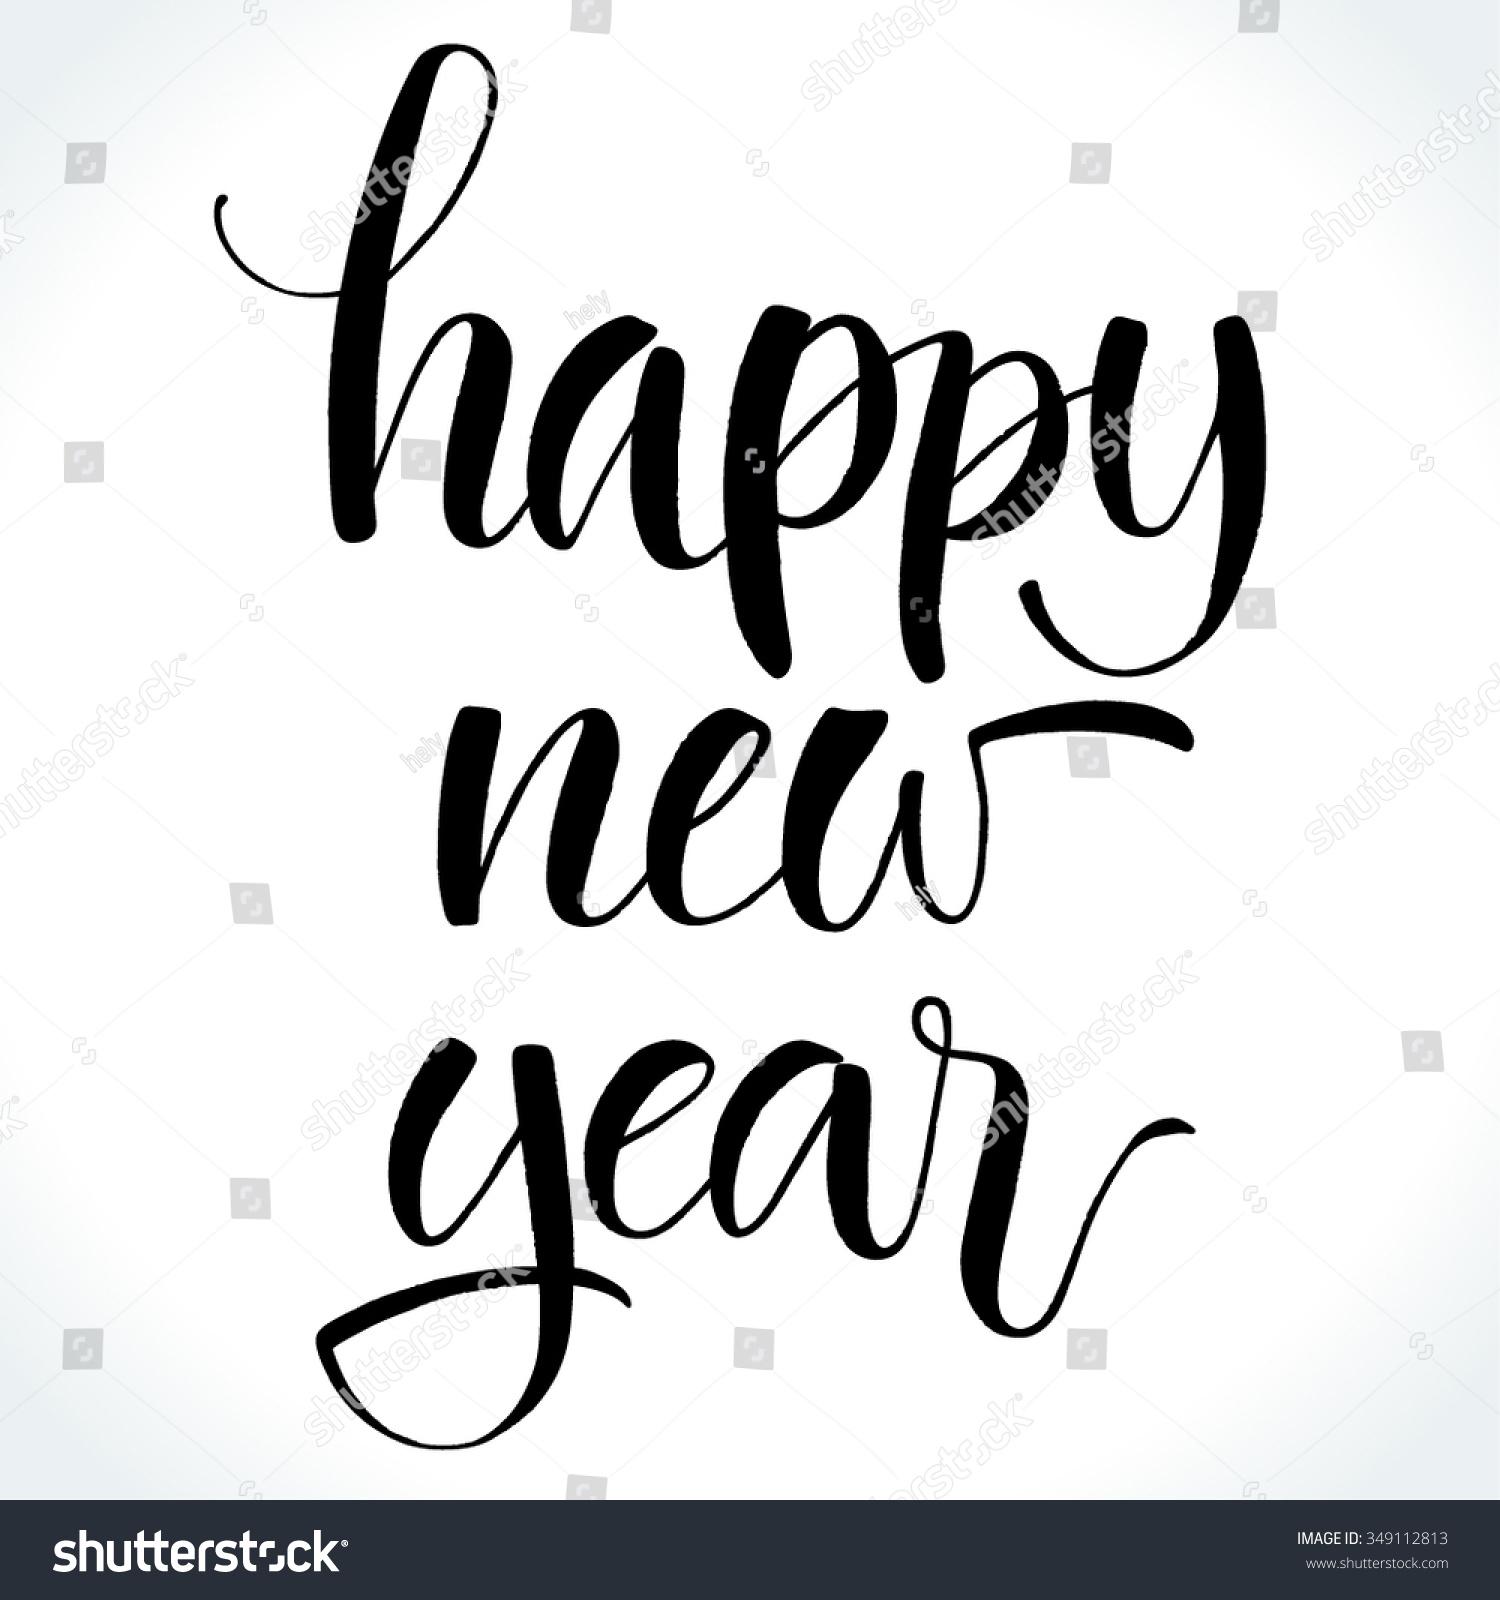 Happy new year modern calligraphy handwritten letters